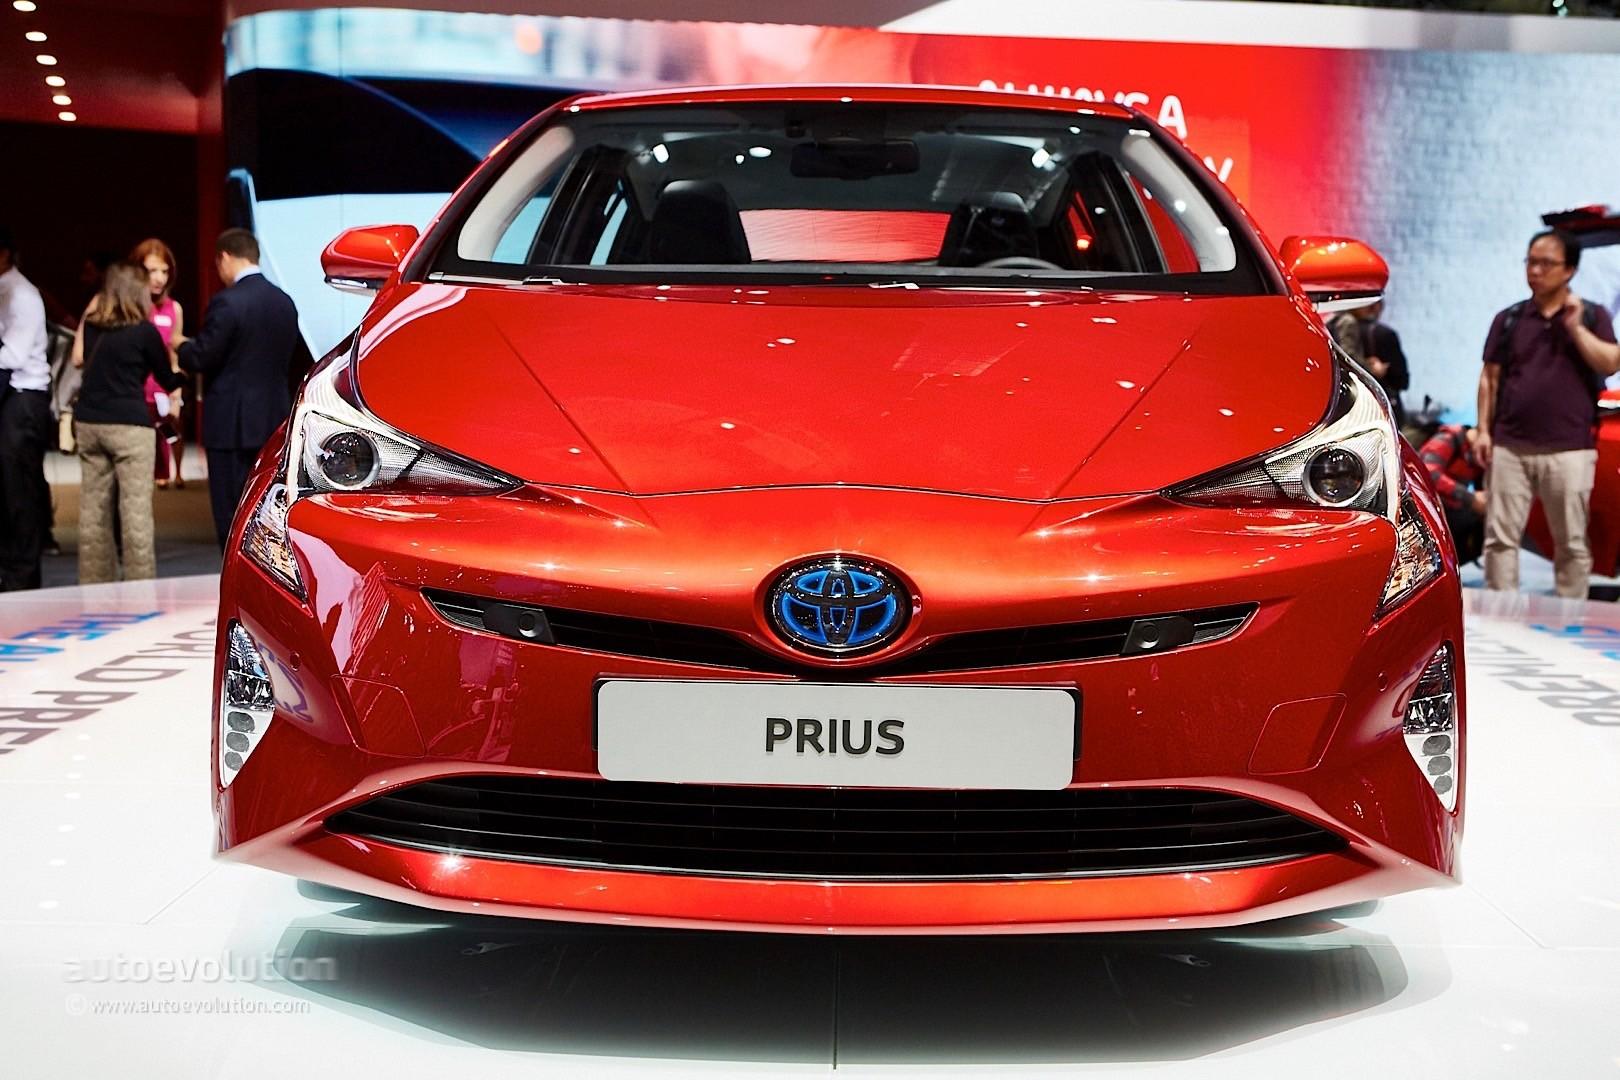 all new camry logo kijang innova 2018 semisena toyota prius recalled over parking brake problem. yes, the ...